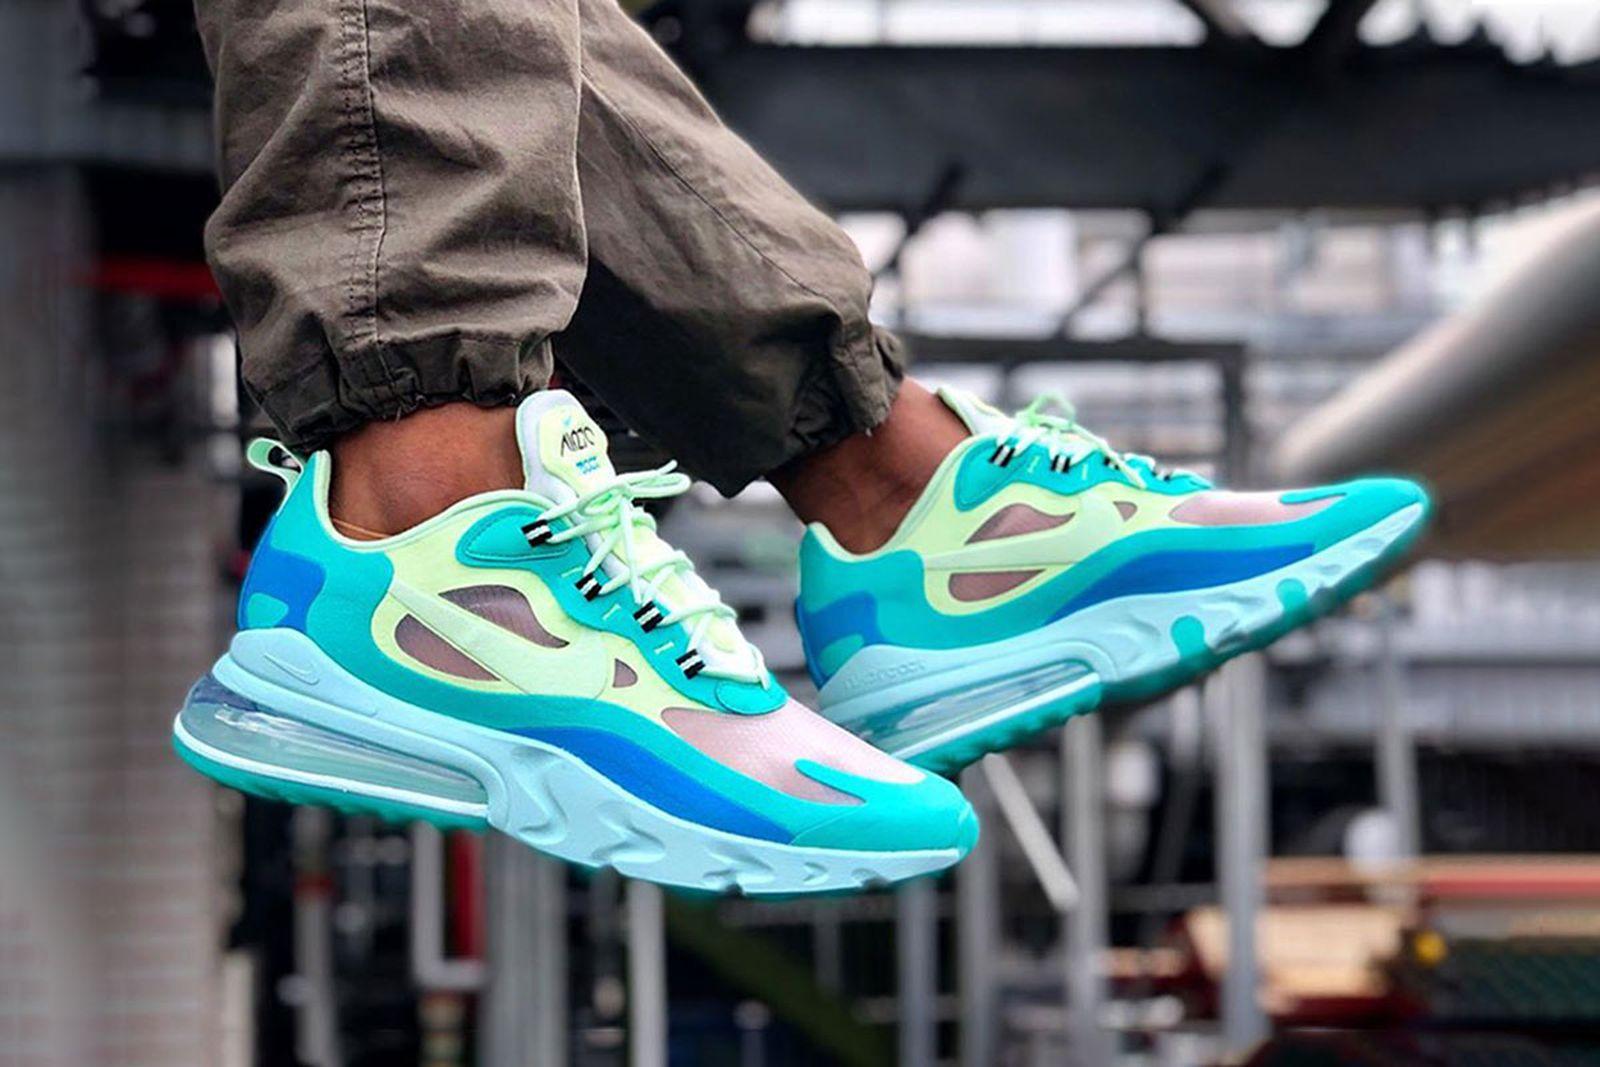 Mamut Frente al mar Tesauro  Nike Air Max 270 React & More Best Instagram Sneaker Photos